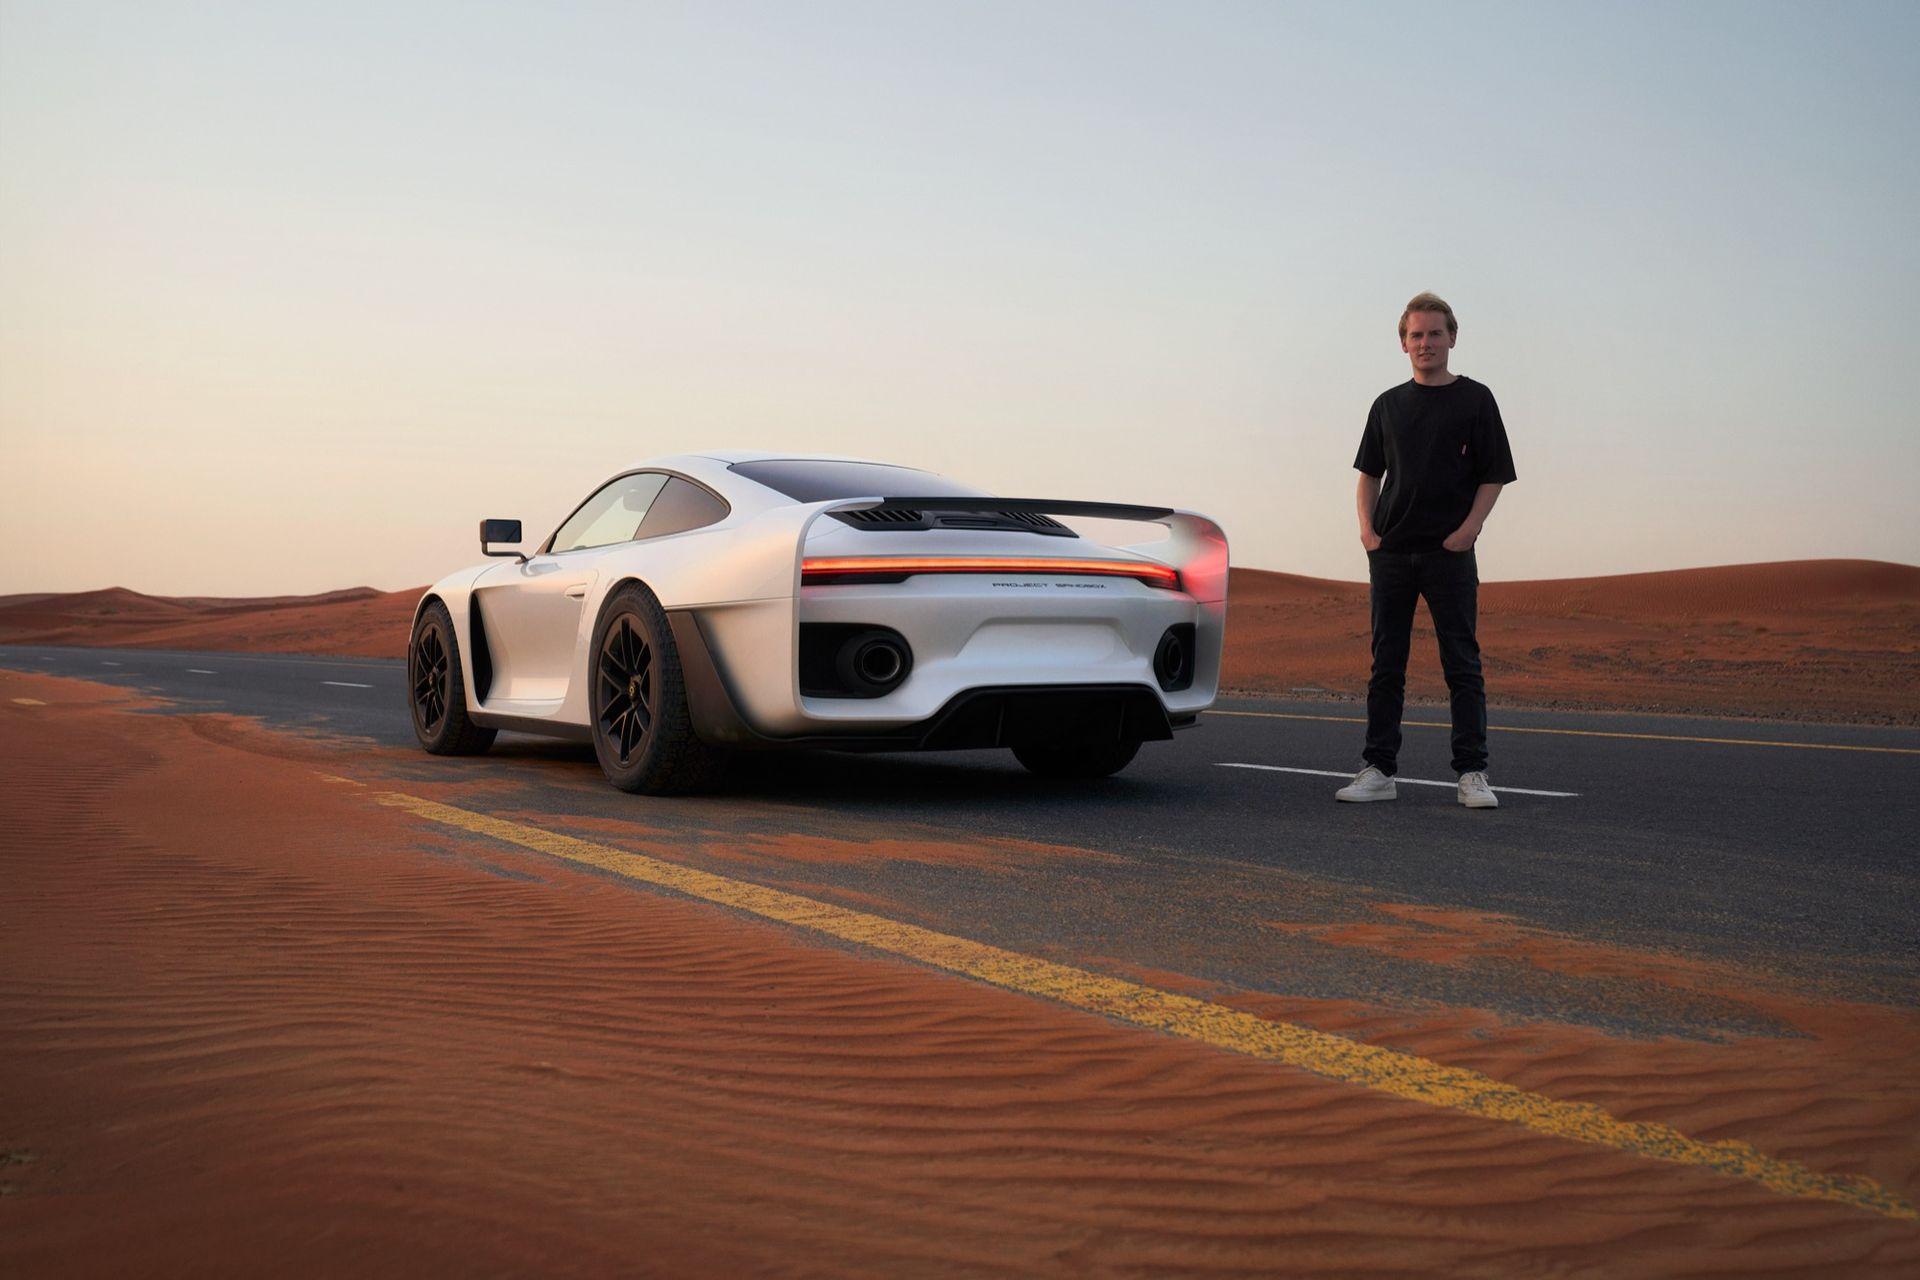 Gemballa-son släpper fantastisk Porsche